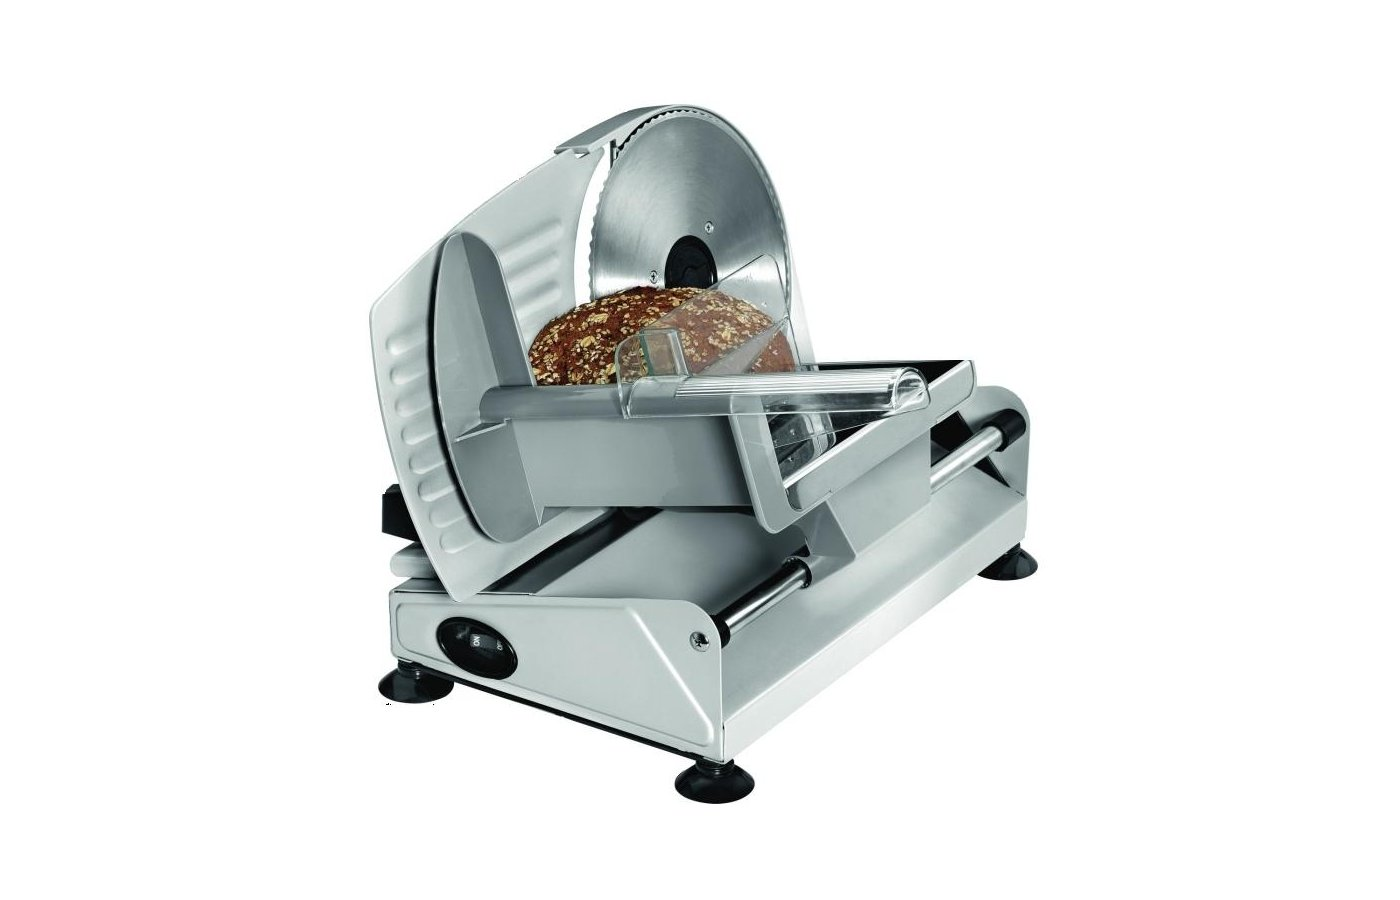 Универсальная резательная машина BOMANN MA 451 CB silber